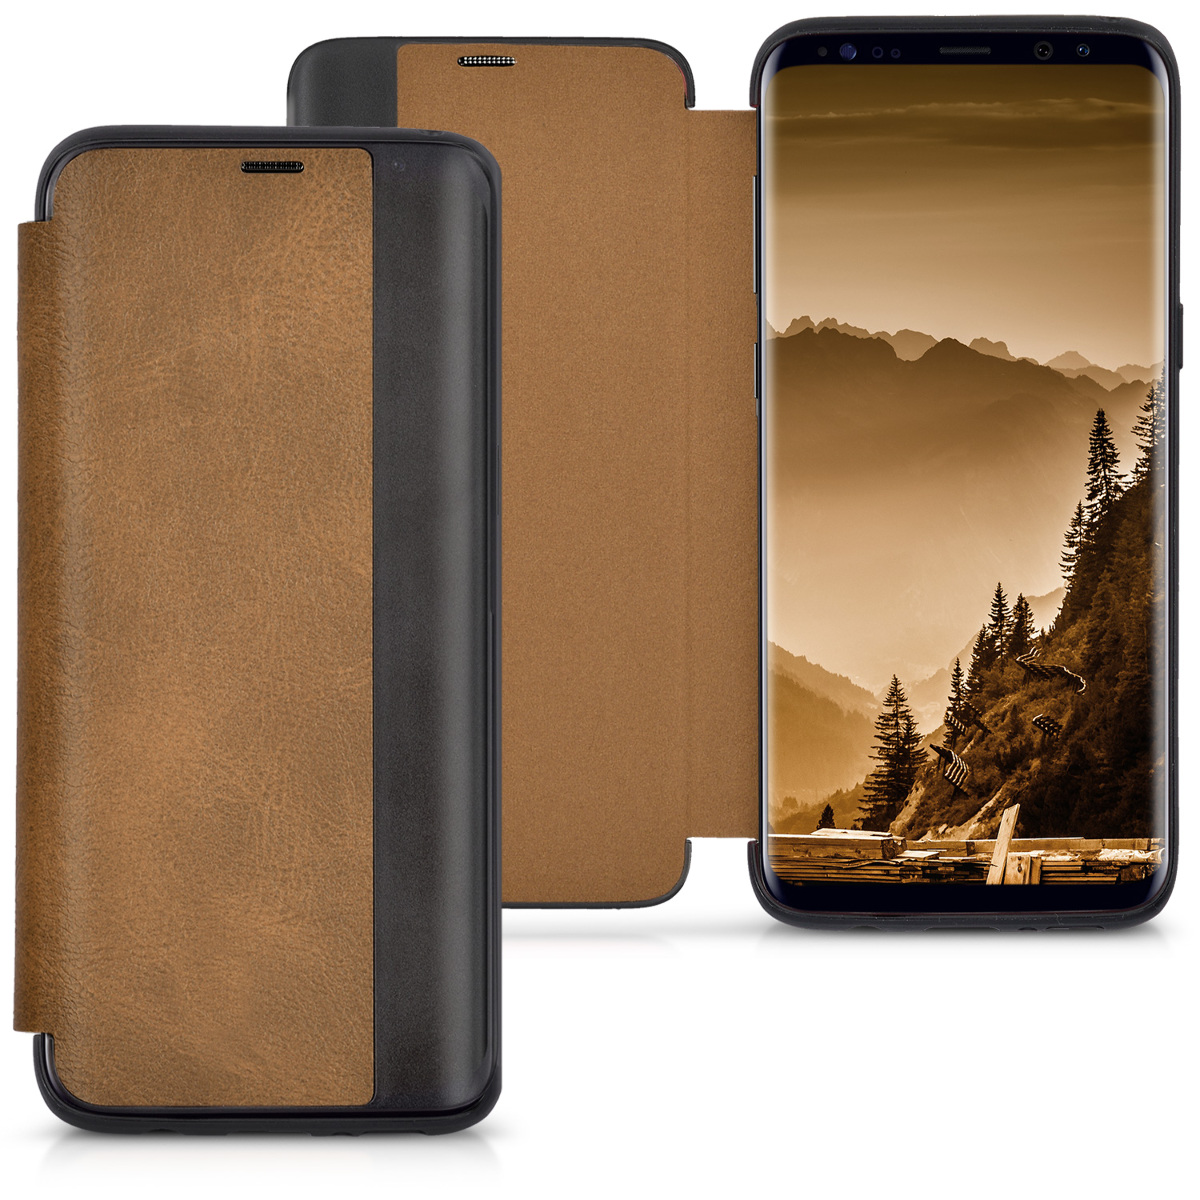 KW Θήκη - Flip Samsung Galaxy S8 - Brown / Black (41782.05)